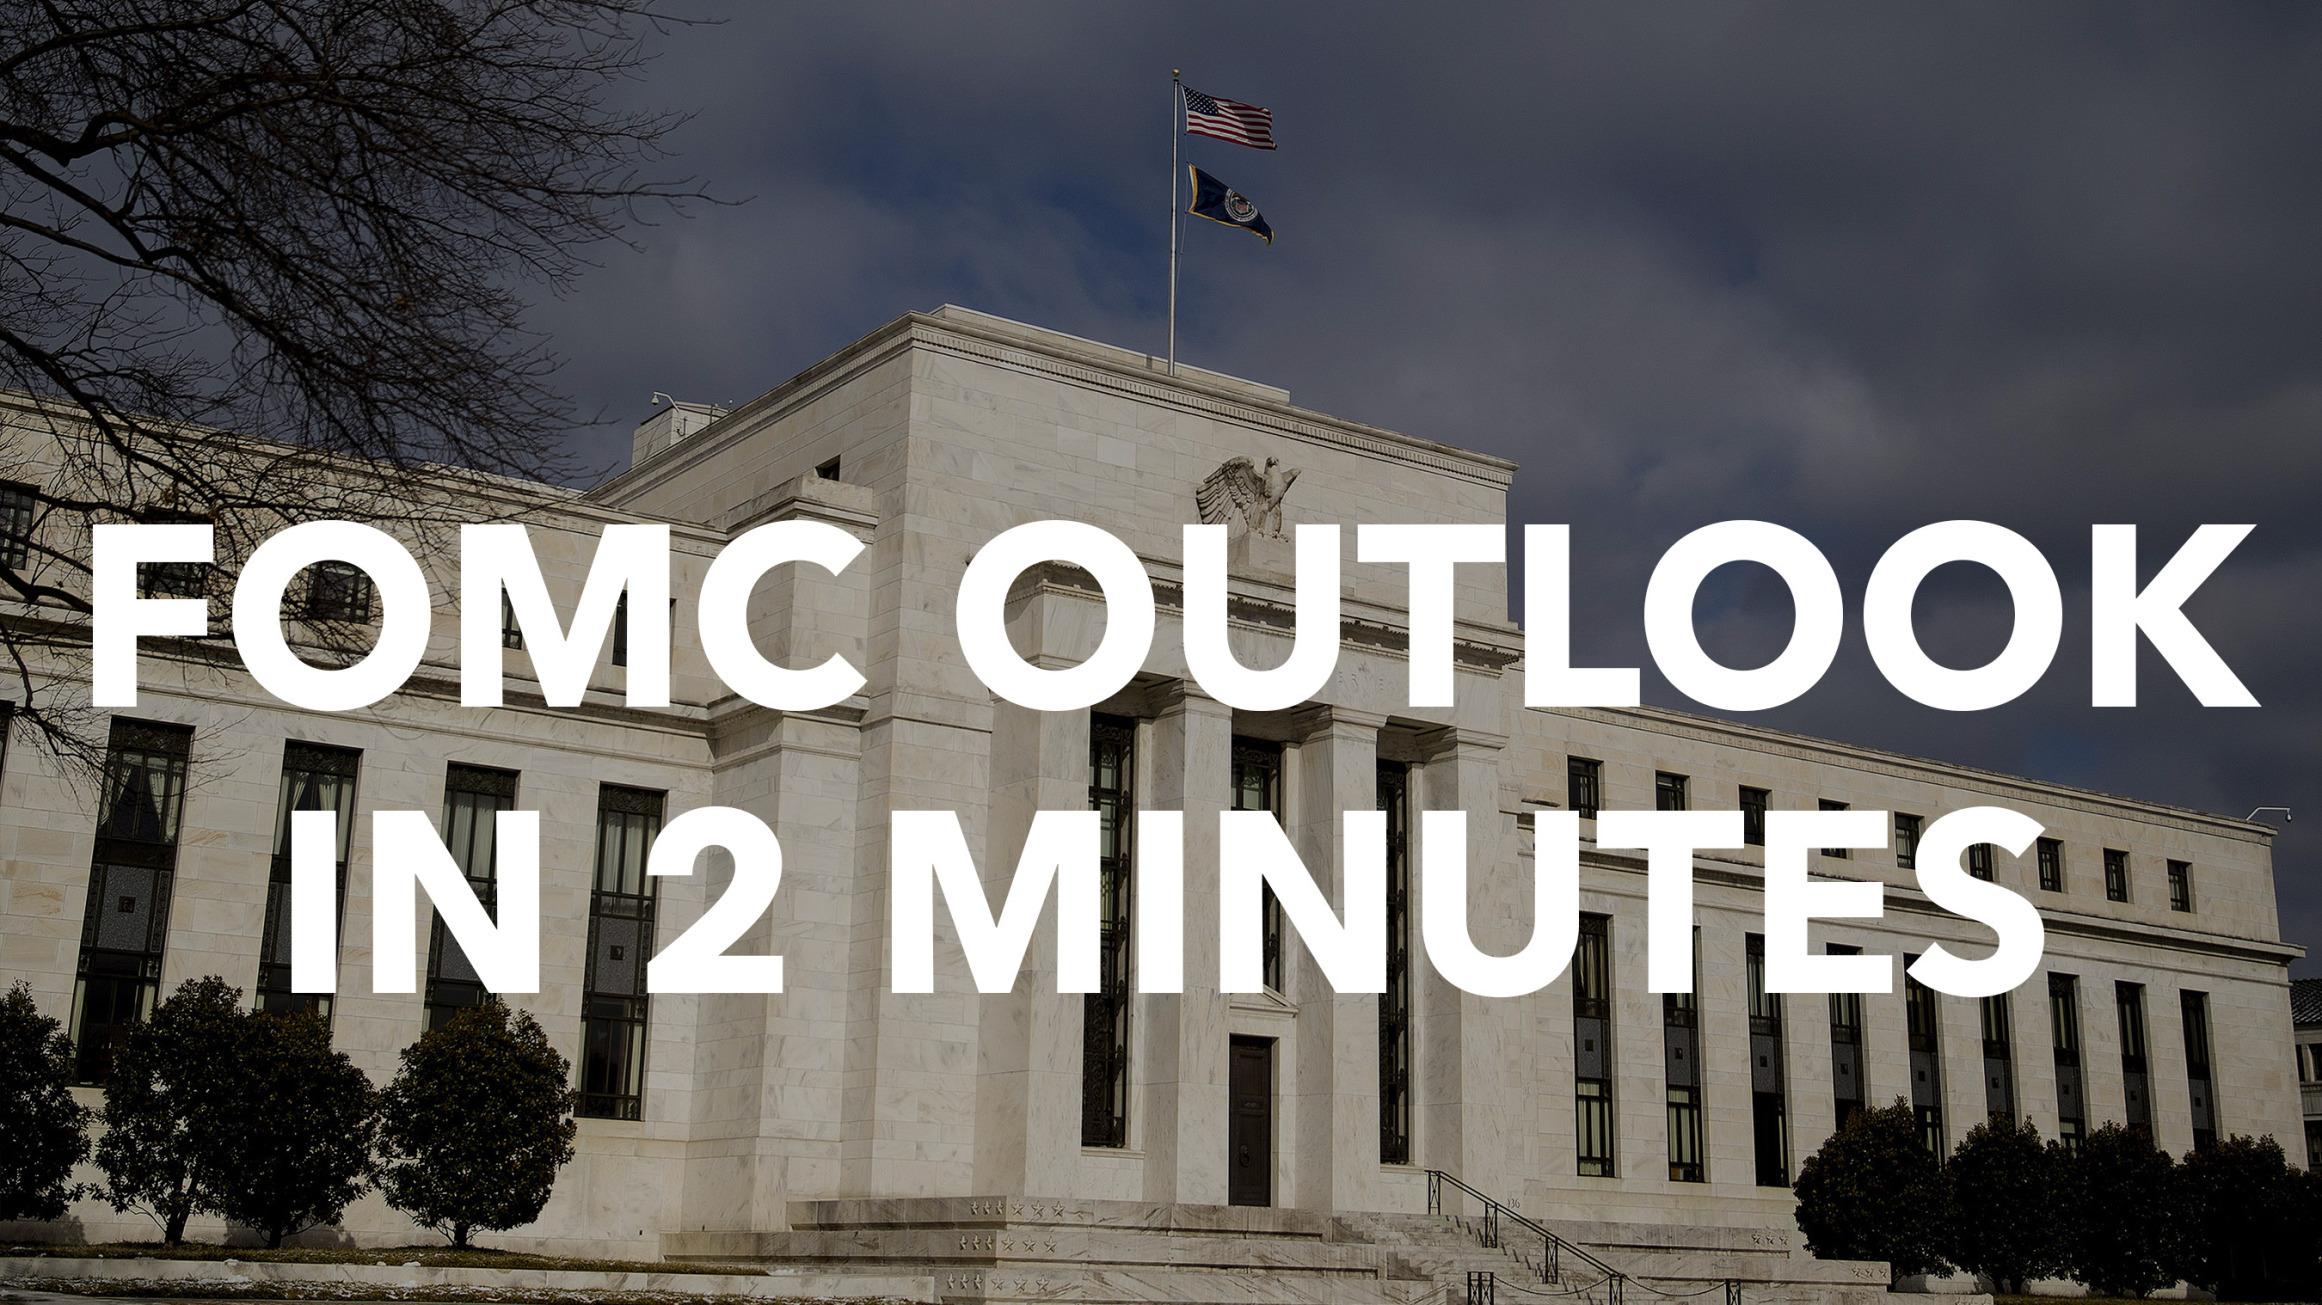 https://www bloomberg com/news/videos/2015-07-24/the-outlook-for